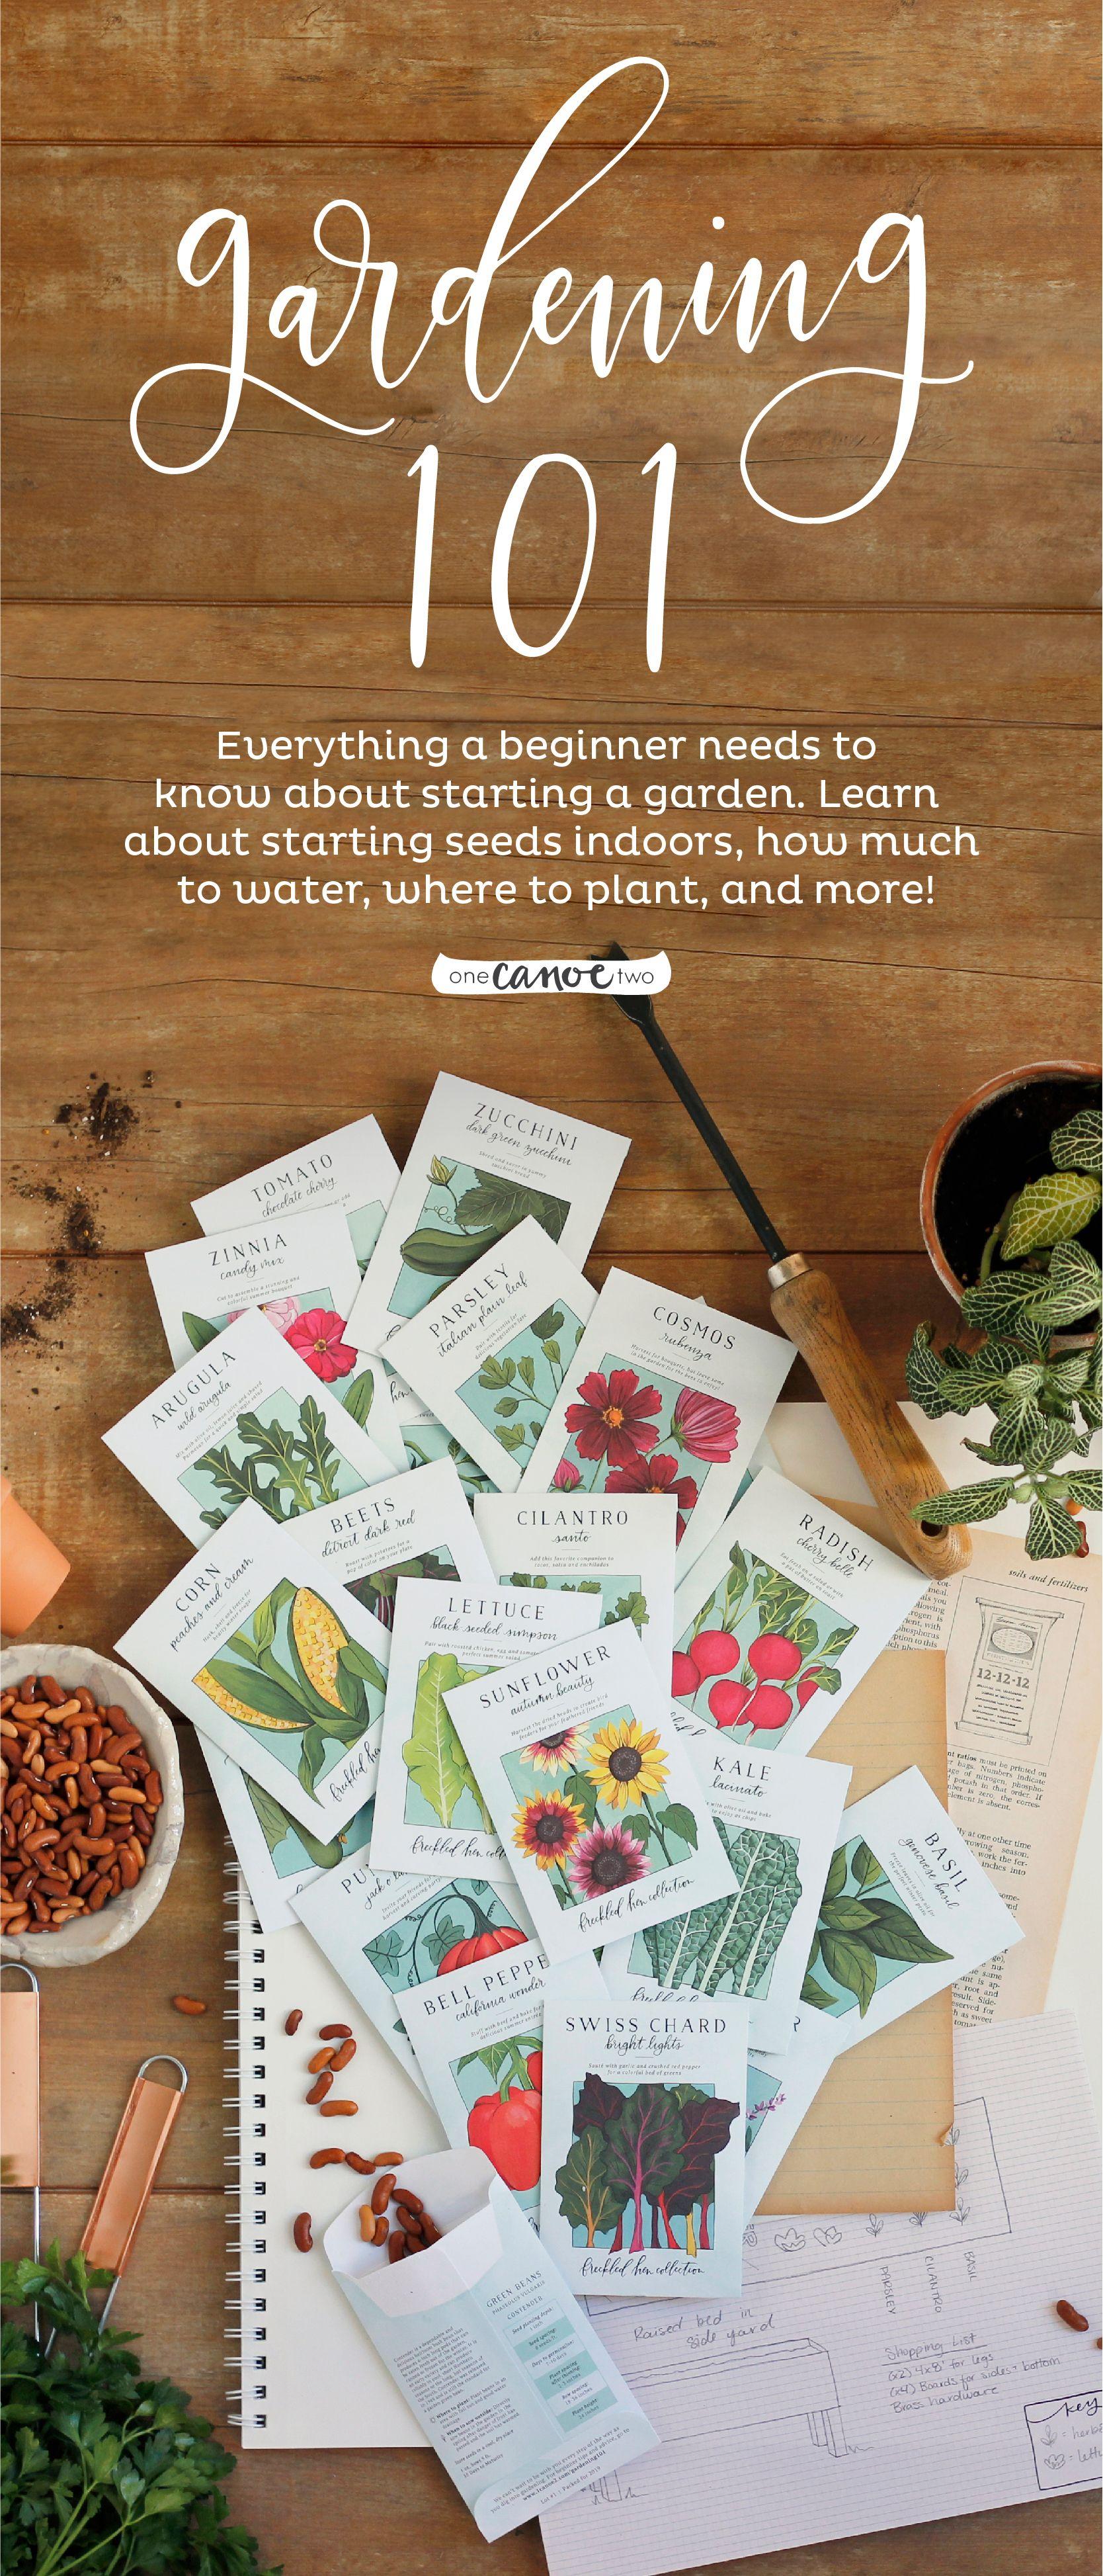 356995dd09453c834faf3672fbb65bdf - Arizona Master Gardener Manual Pdf Download